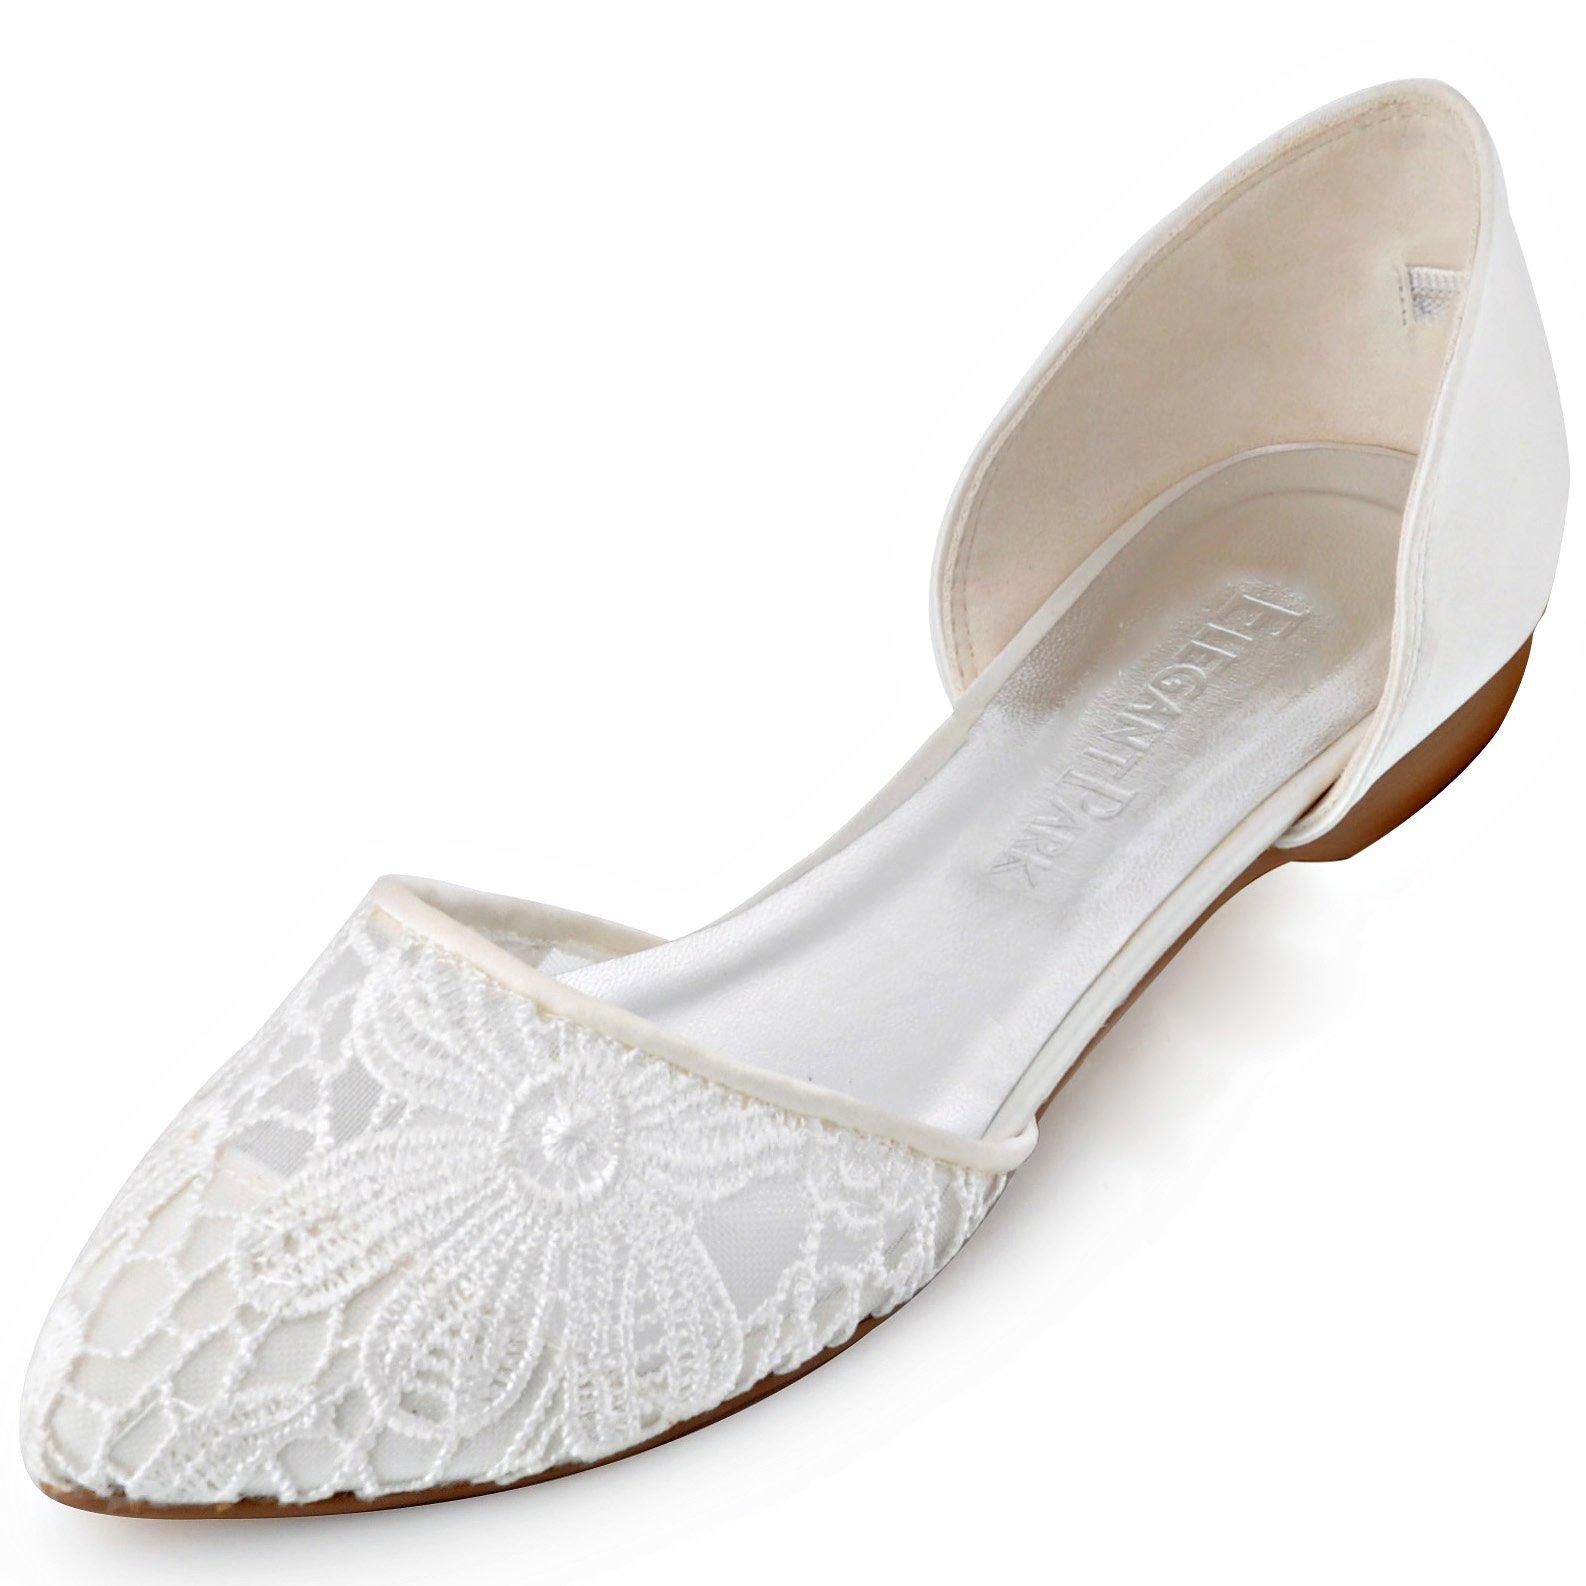 ElegantPark FC1527 Women Comfort Heel Pointed Toe Lace Bridal Wedding Flats Ivory US 7